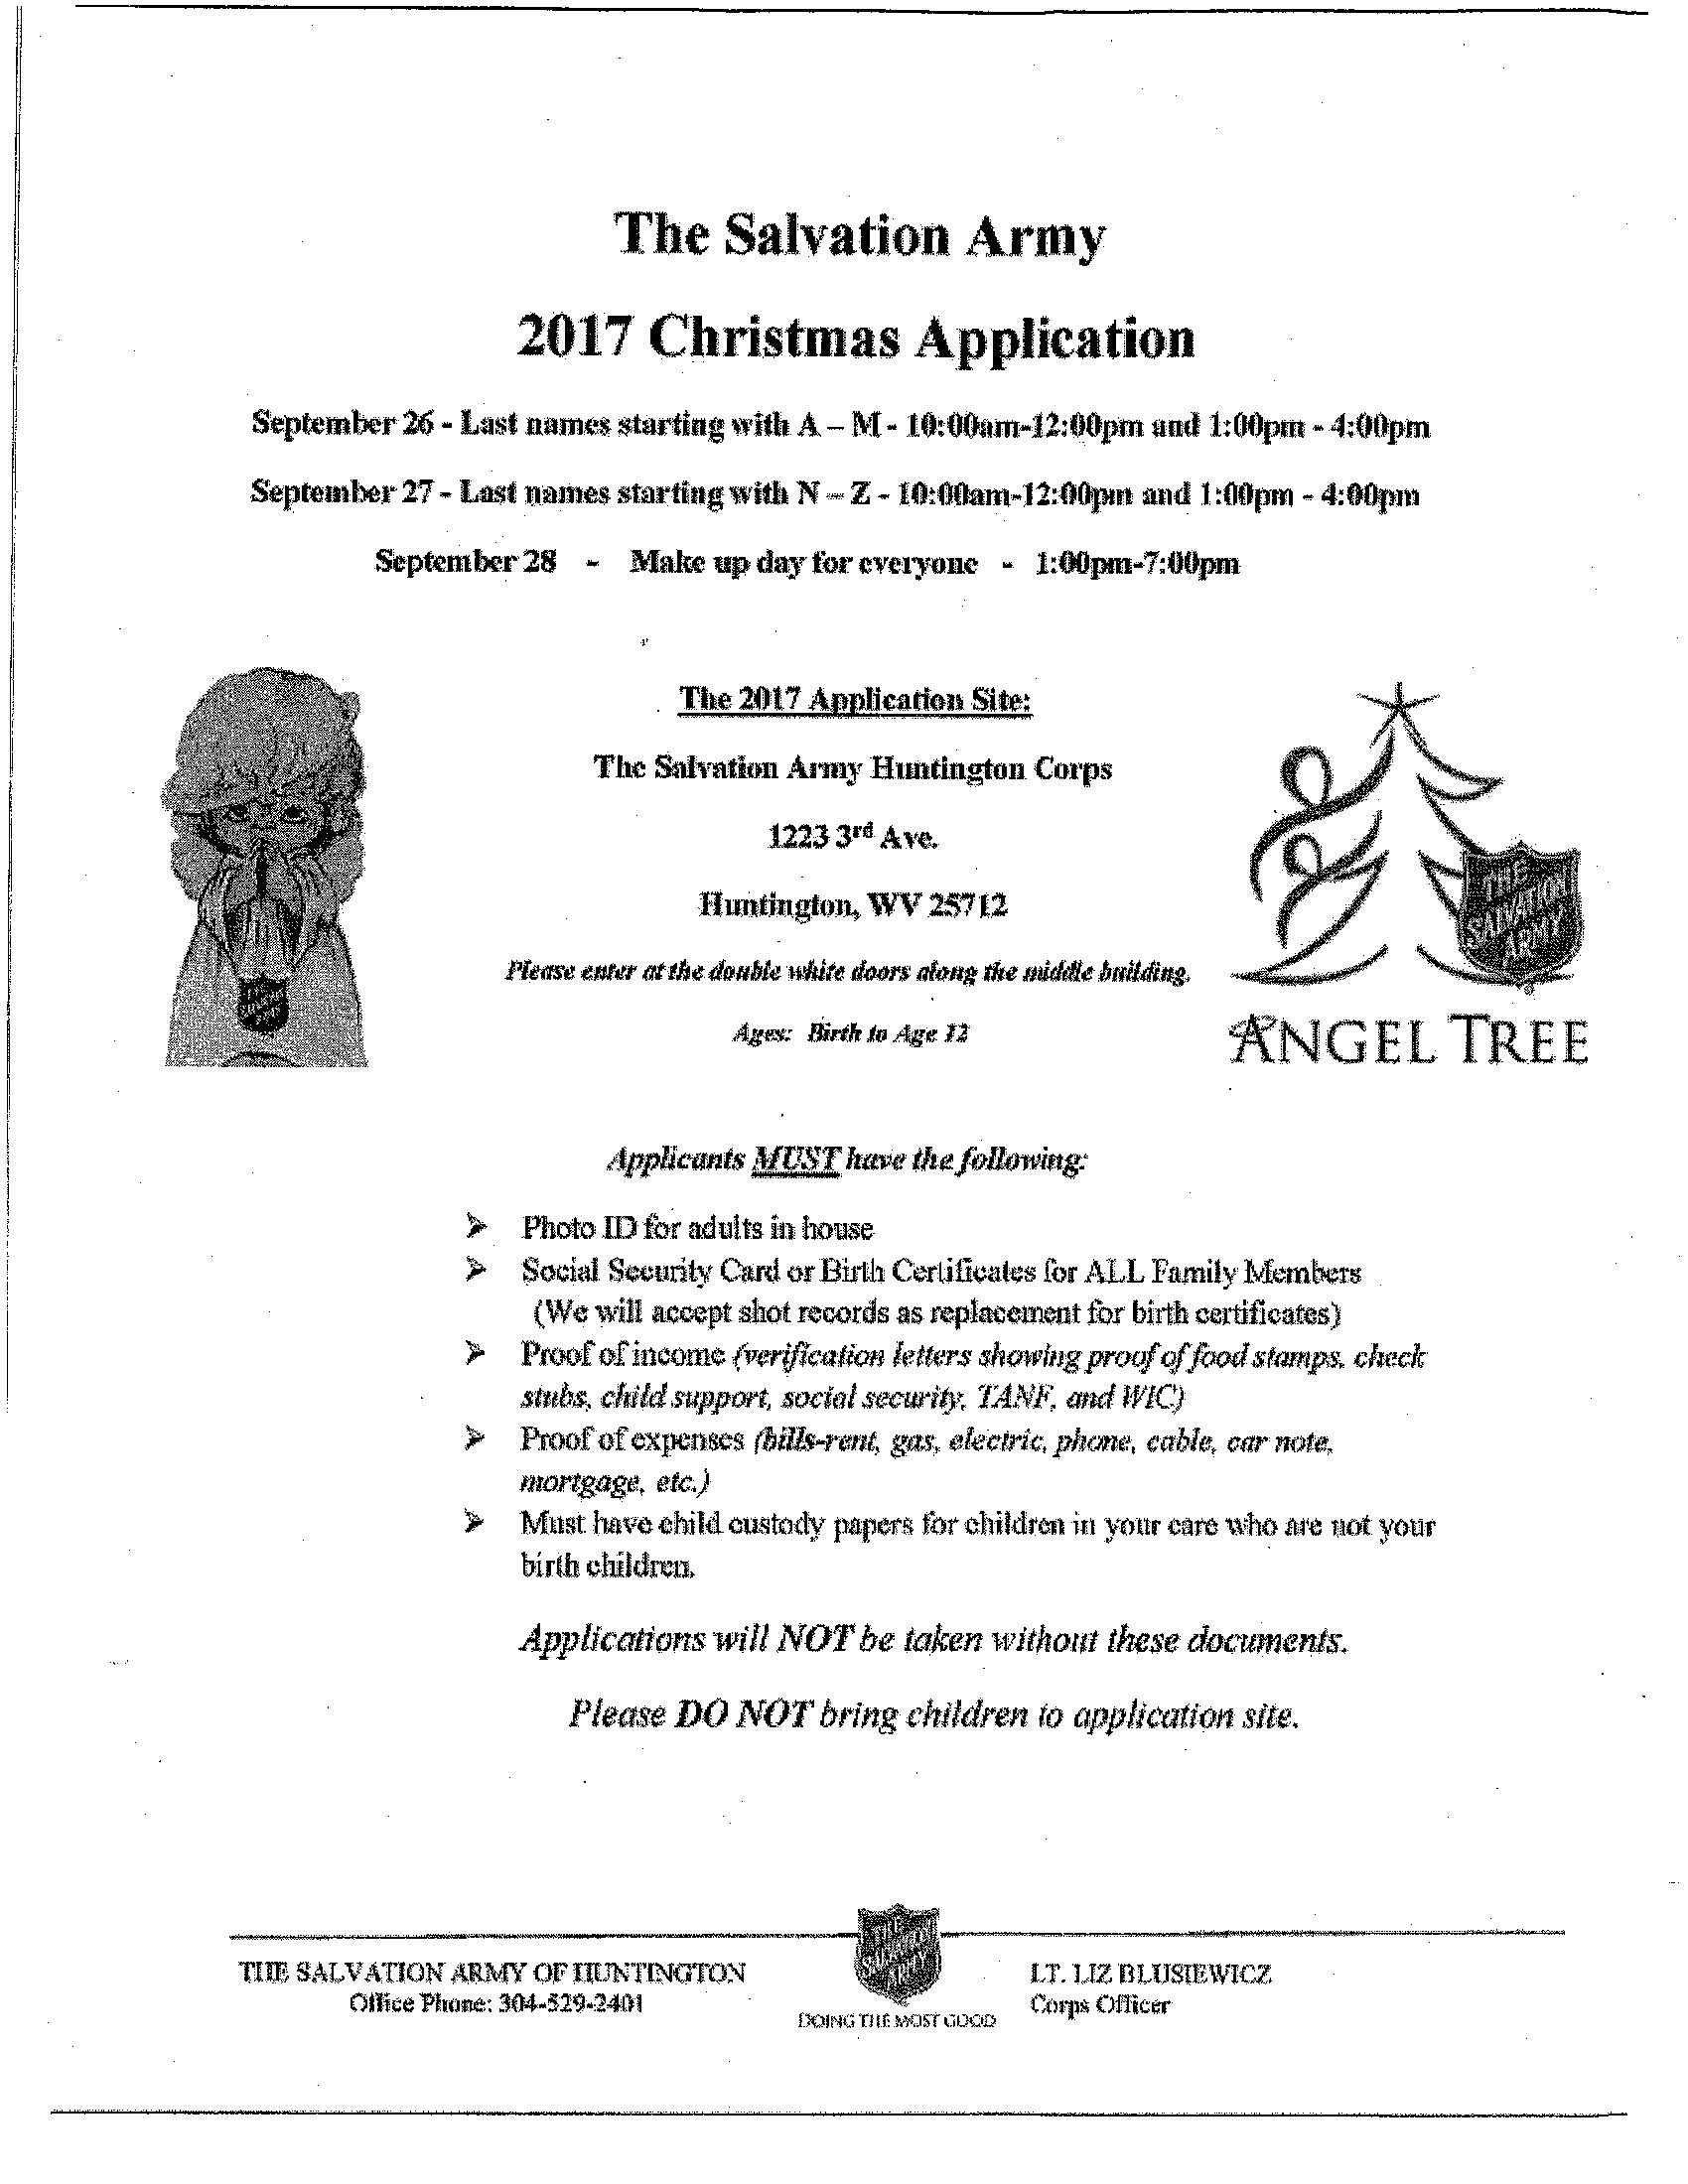 2017 salvation army christmas sign ups sept 26 27 28 download pdf printable flyer